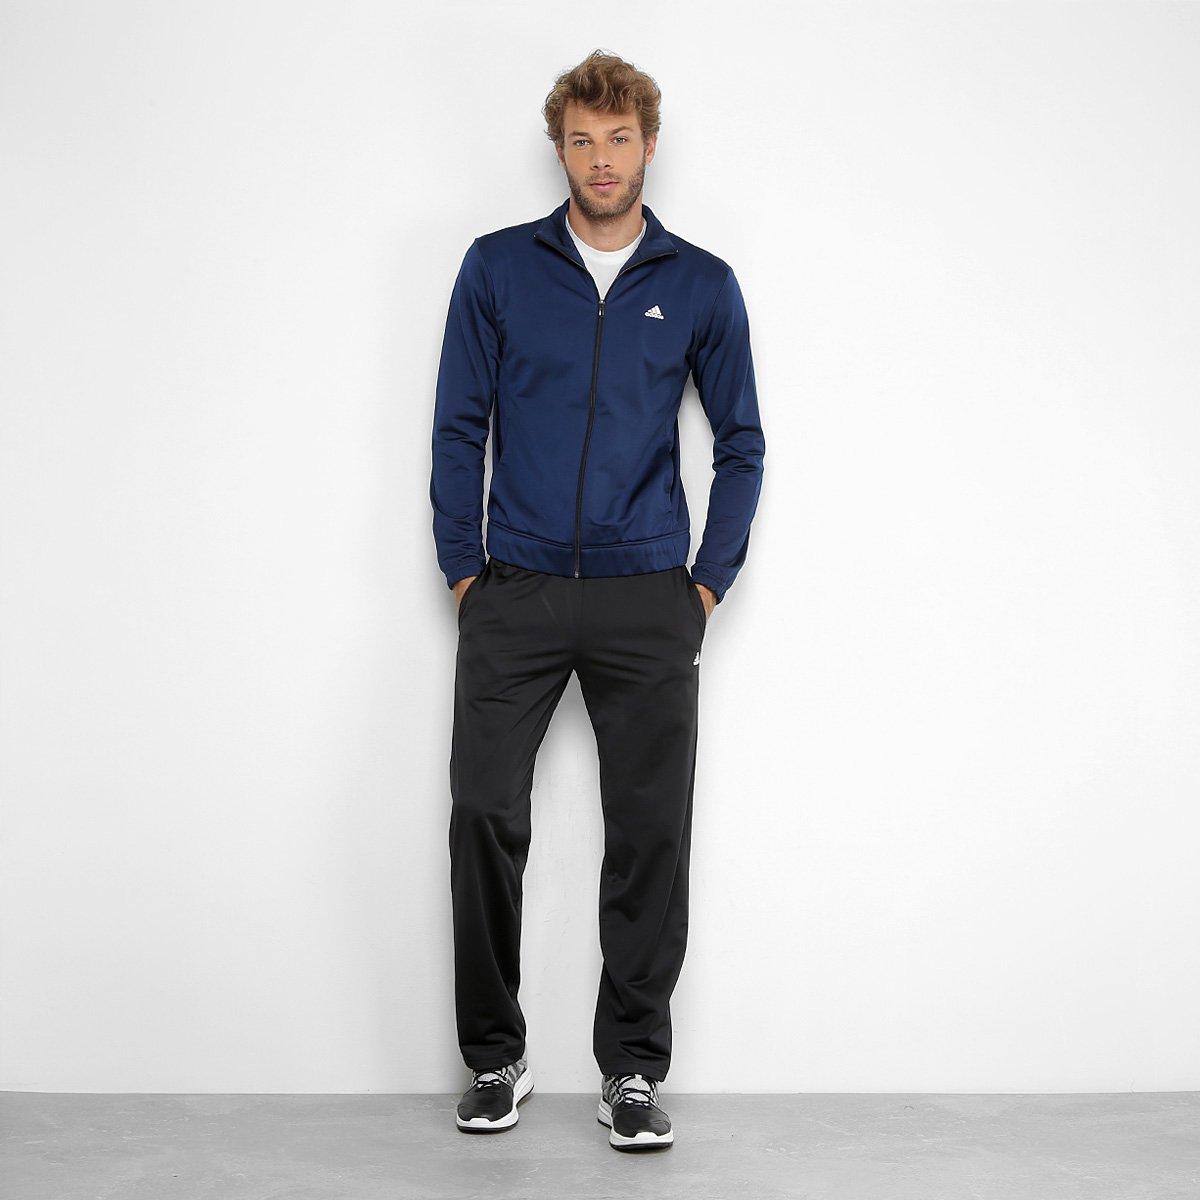 9851440fb Agasalho Adidas Ep Masculino | Allianz Parque Shop